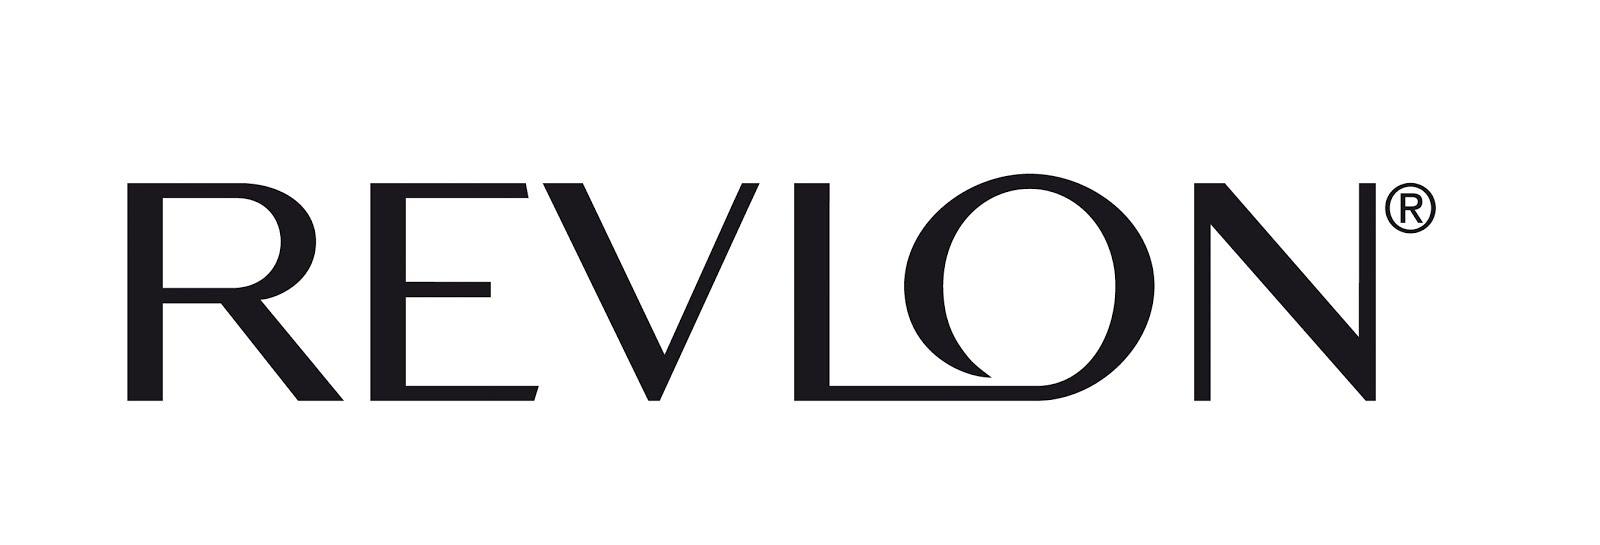 REVLON SLOVENSKO